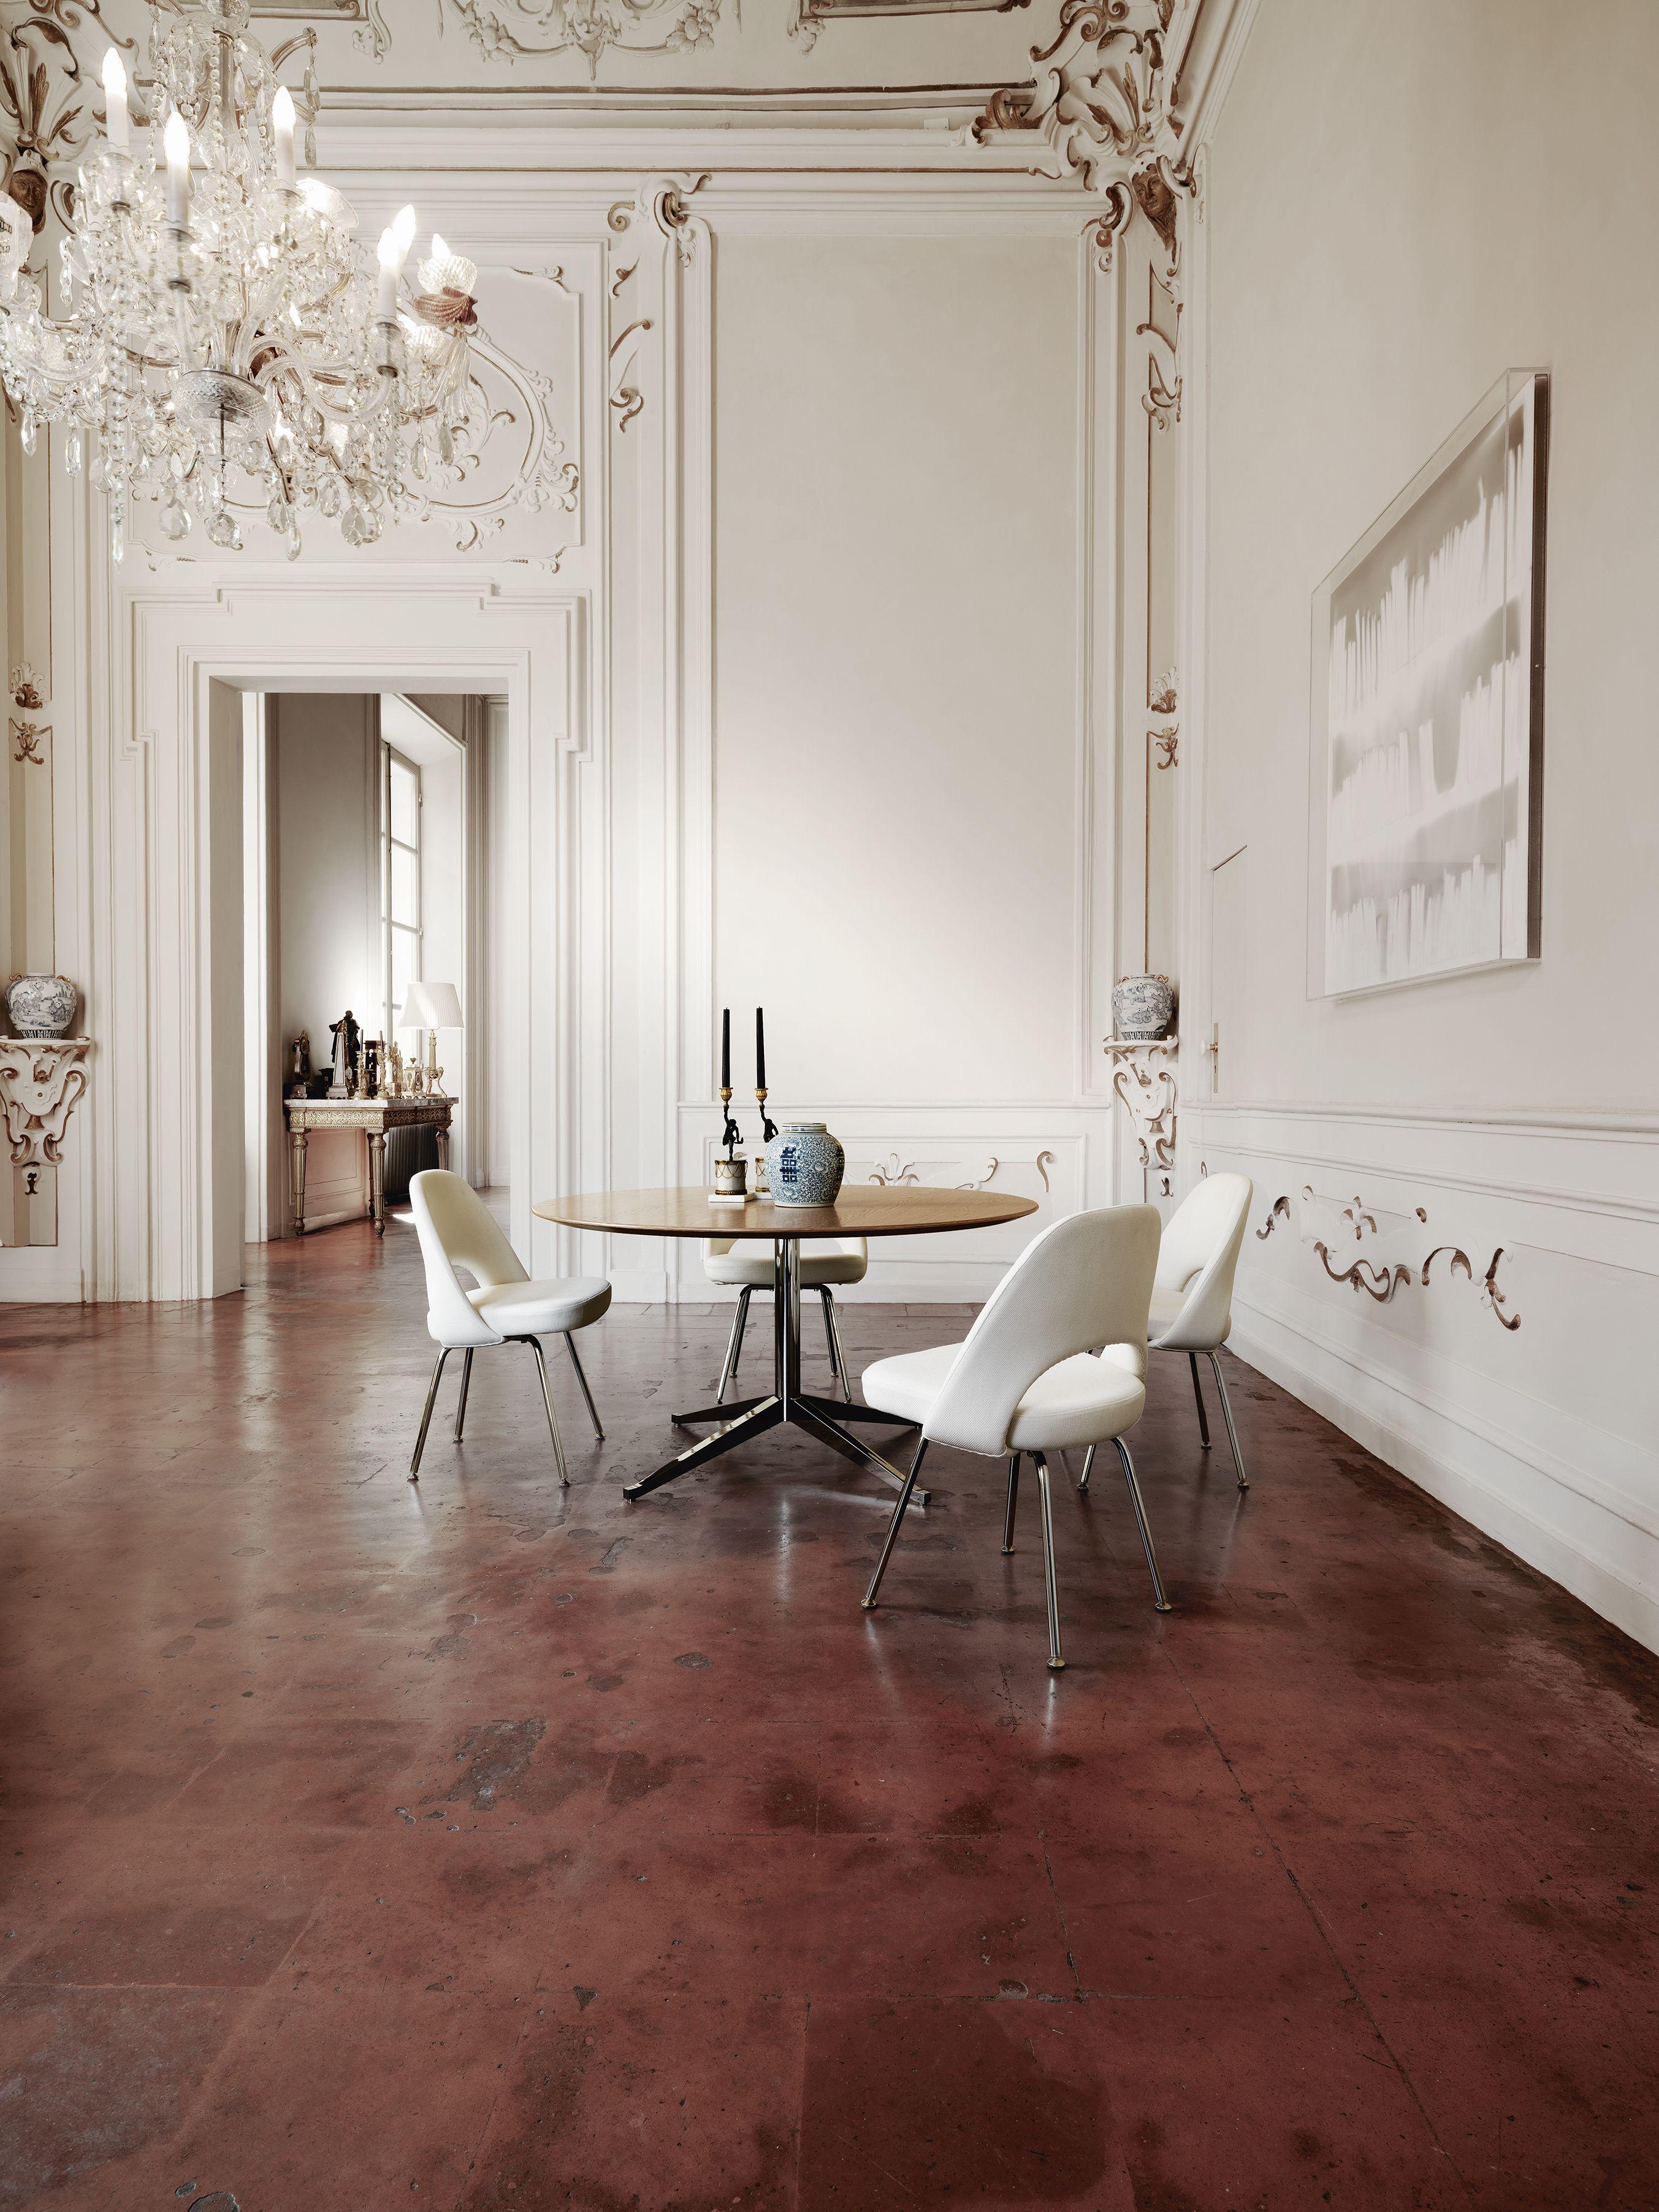 Florence Knoll Table Desk And Saarinen Executive Chairs Meuble Salle A Manger Maison Architecte Interieur